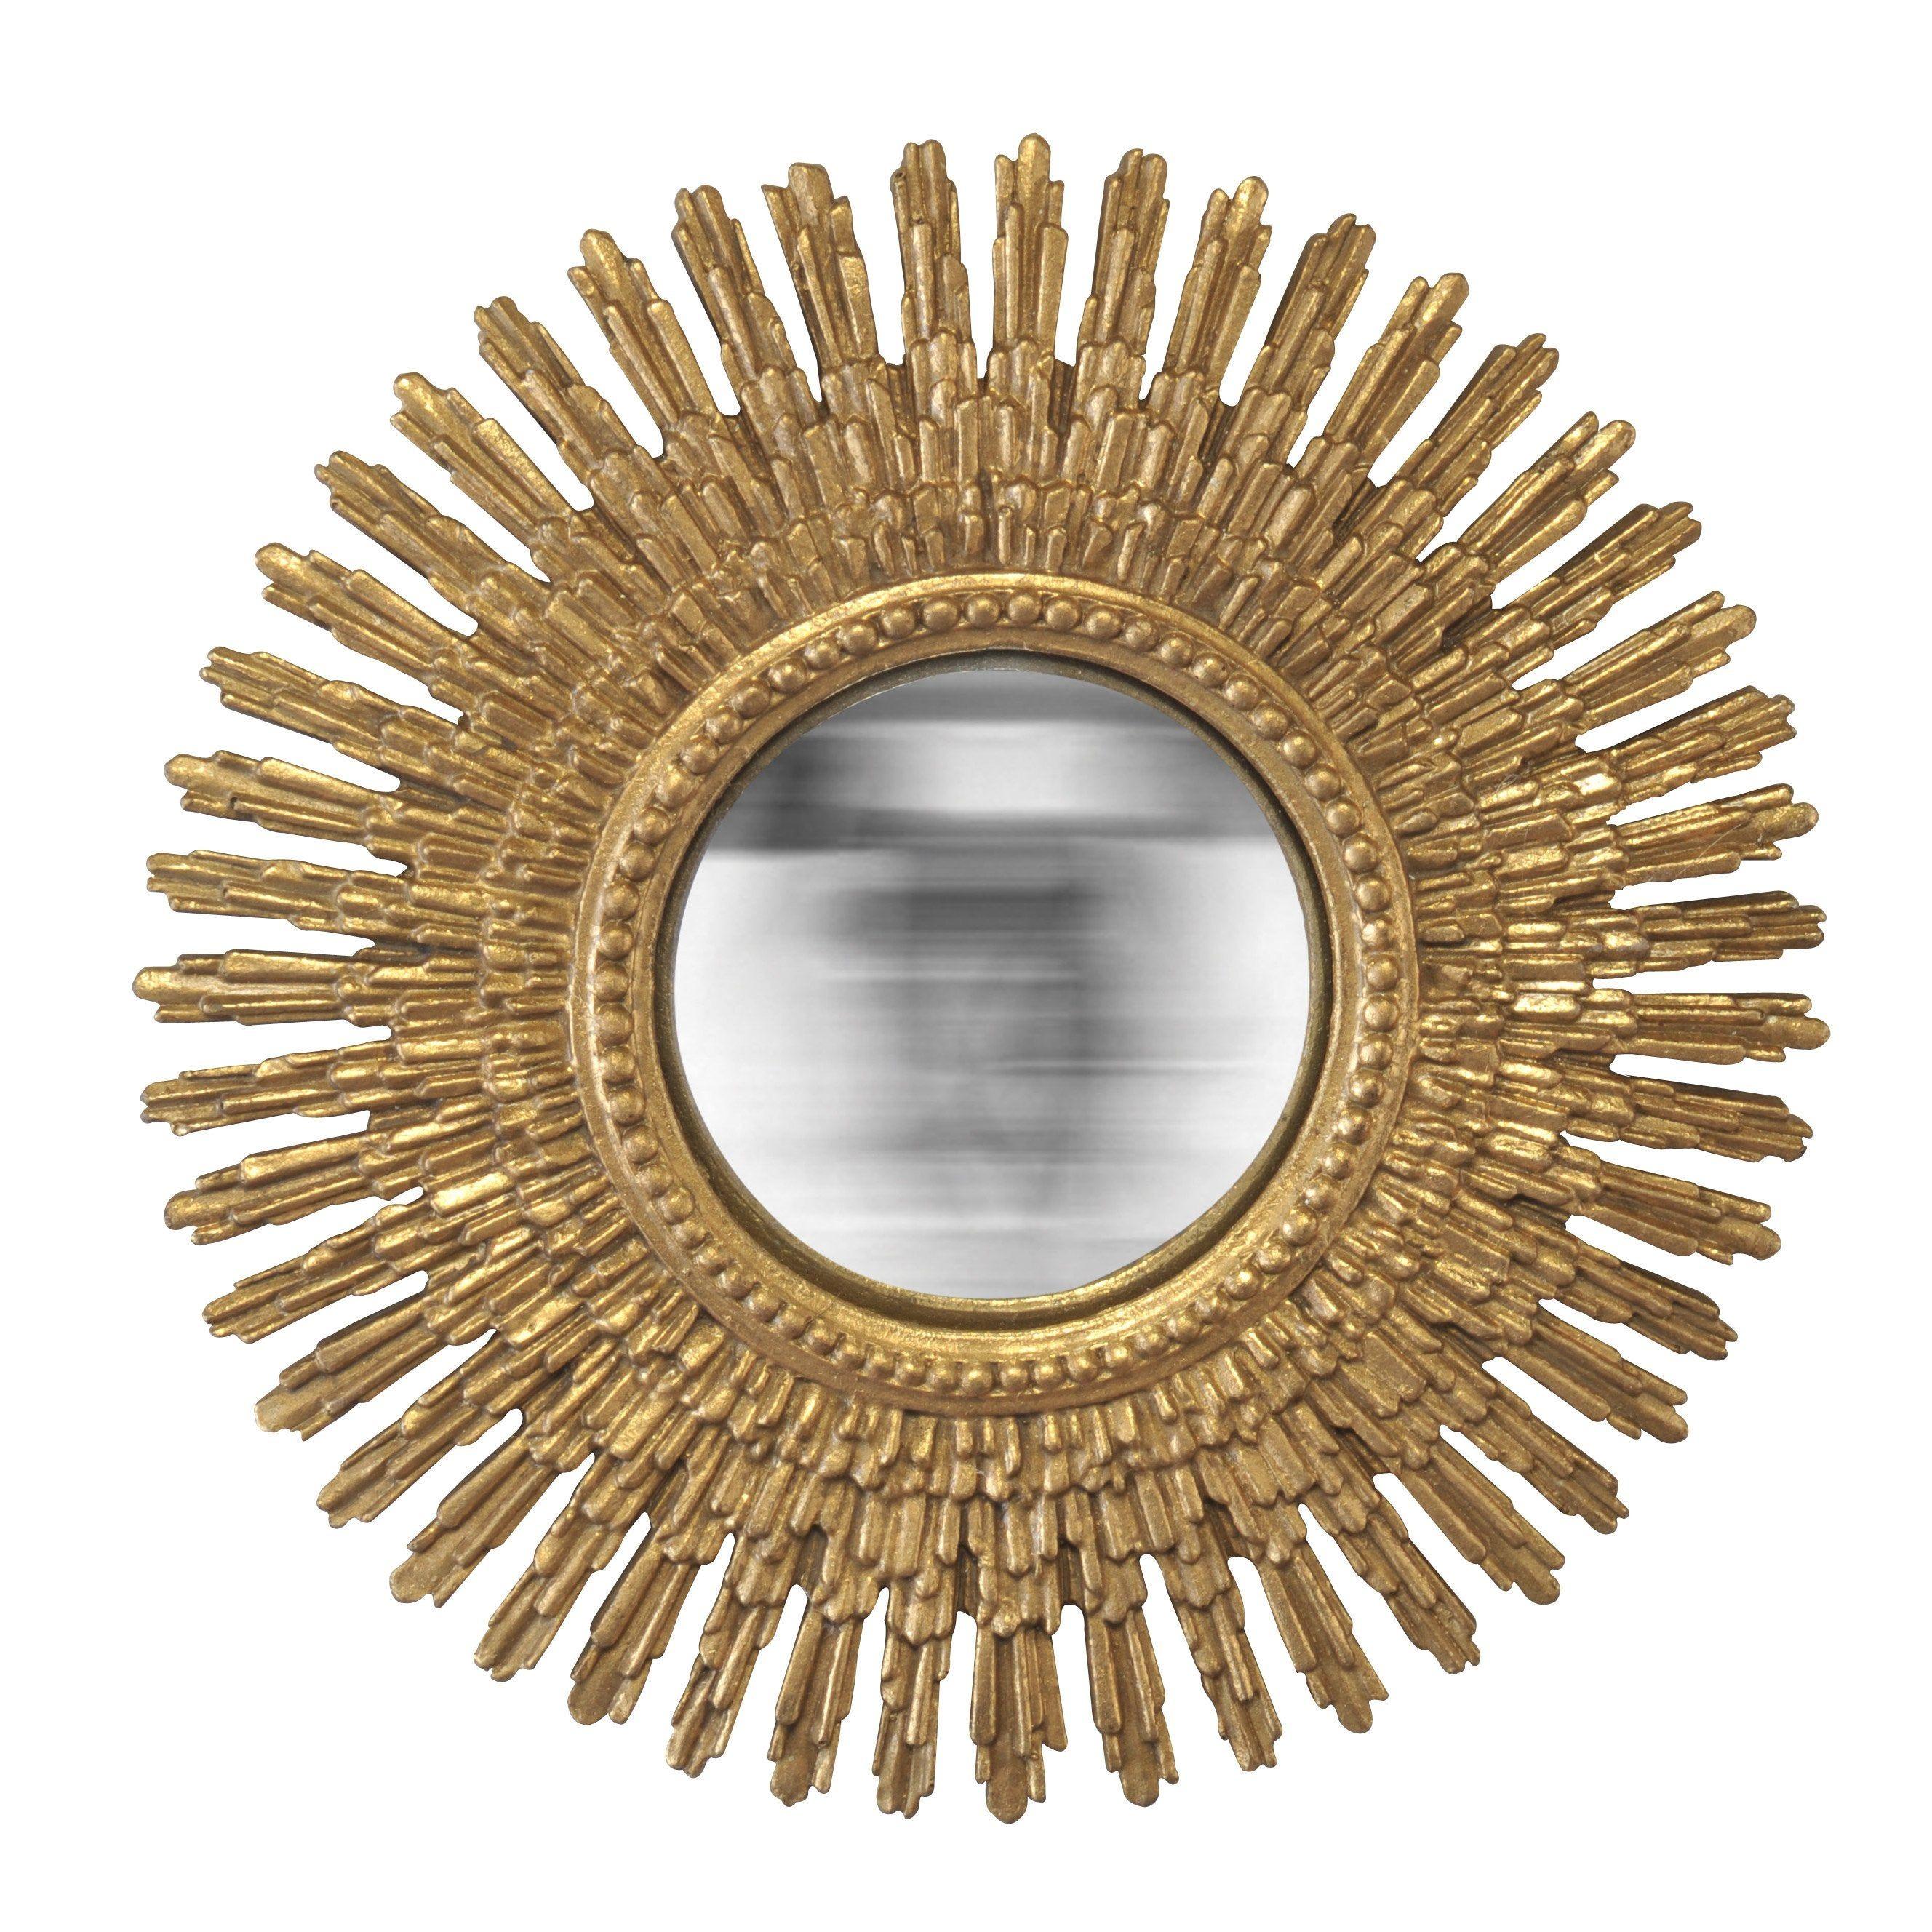 Miroir Rond Soleil Convexe Or Diam 30 Cm Miroir Soleil Miroir Rond Et Miroir